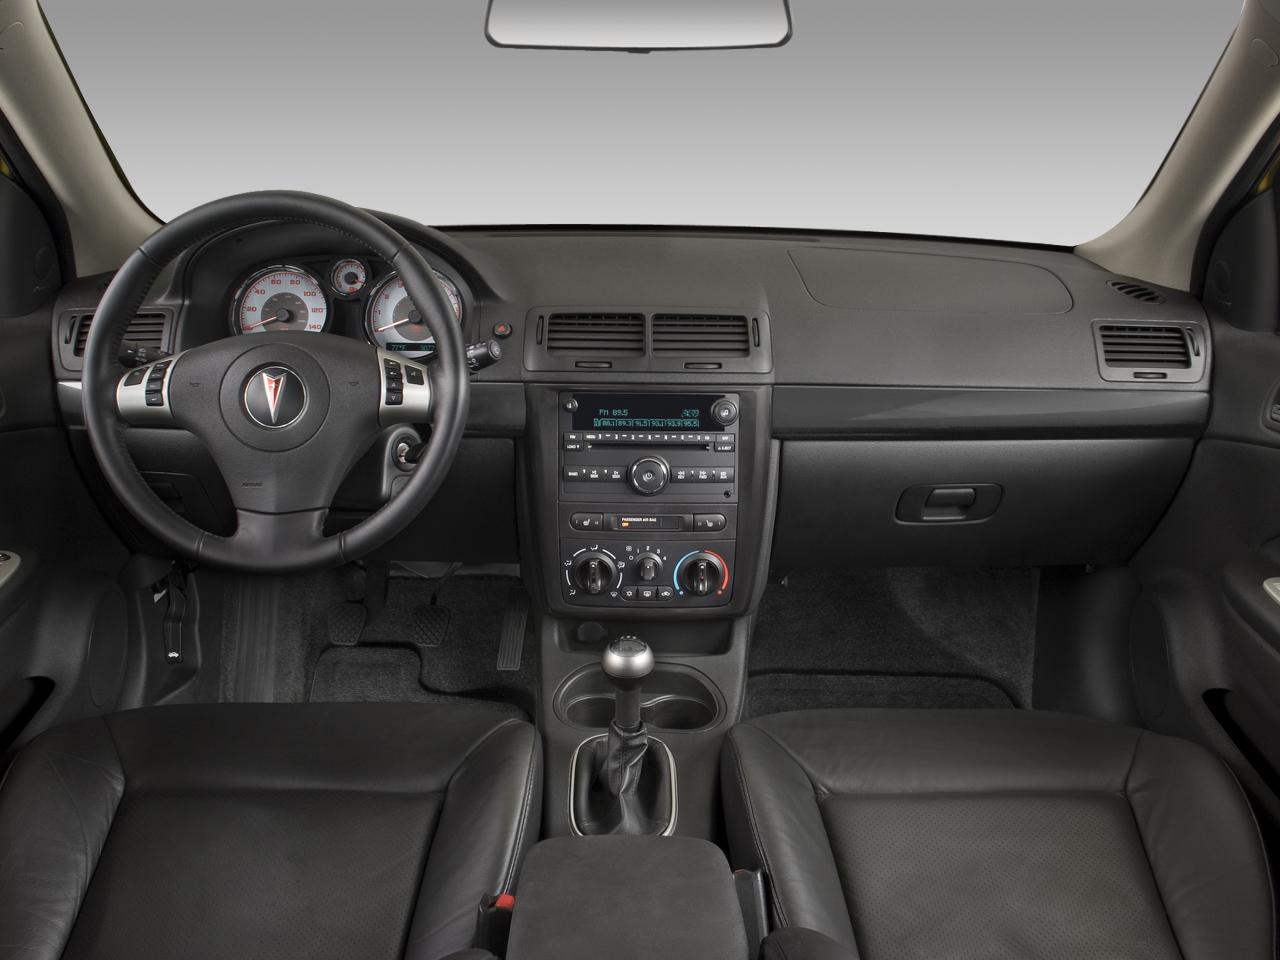 2009 Pontiac G5 Partsopen